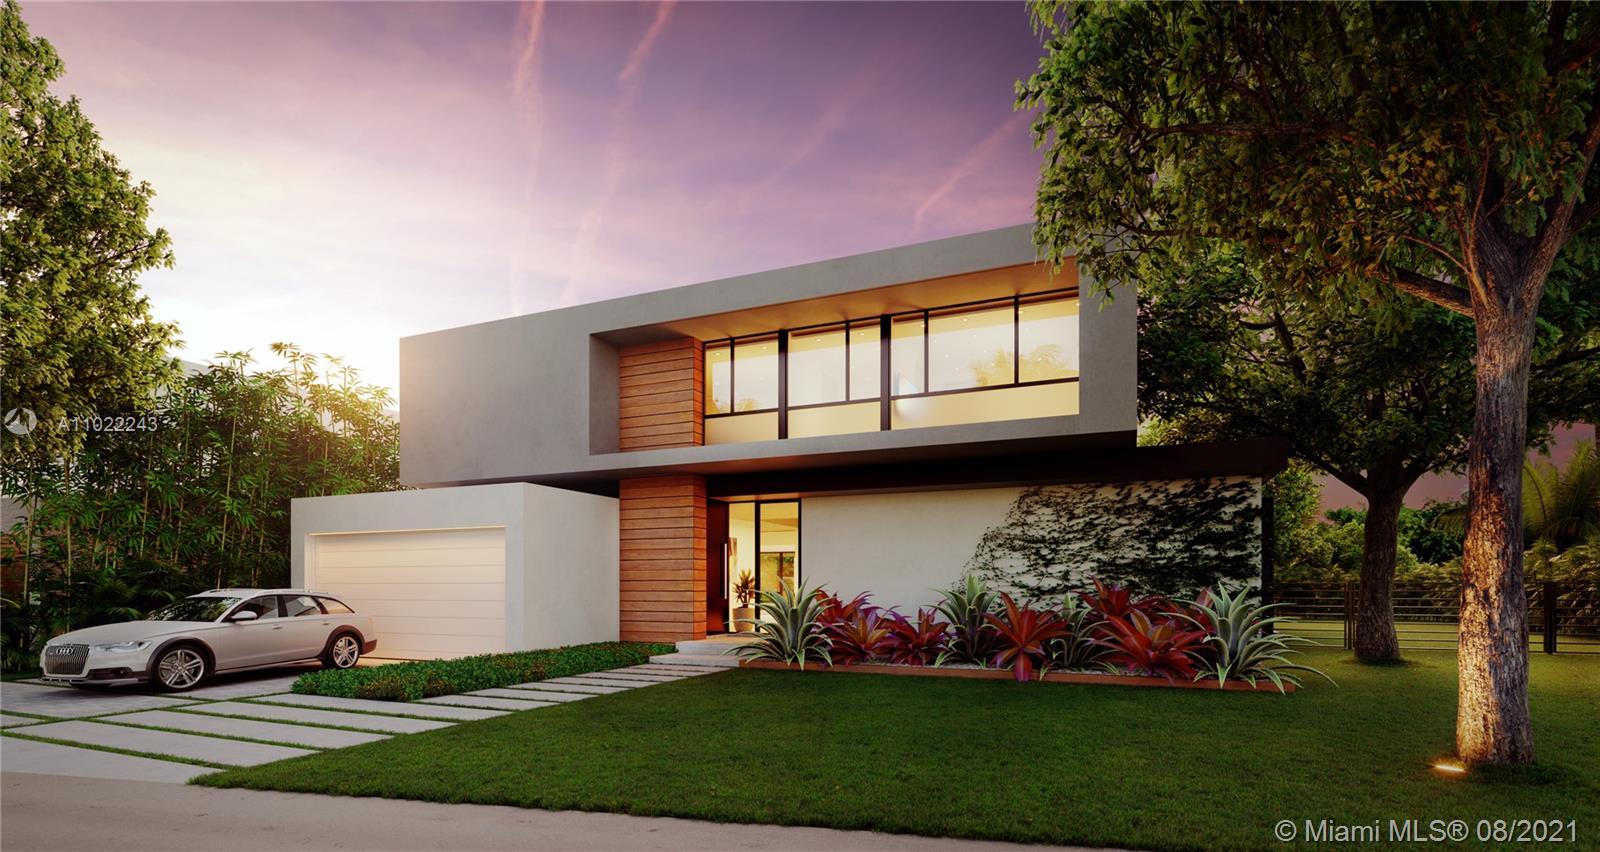 Property for sale at 2931 Riverland Rd, Fort Lauderdale,  Florida 33312